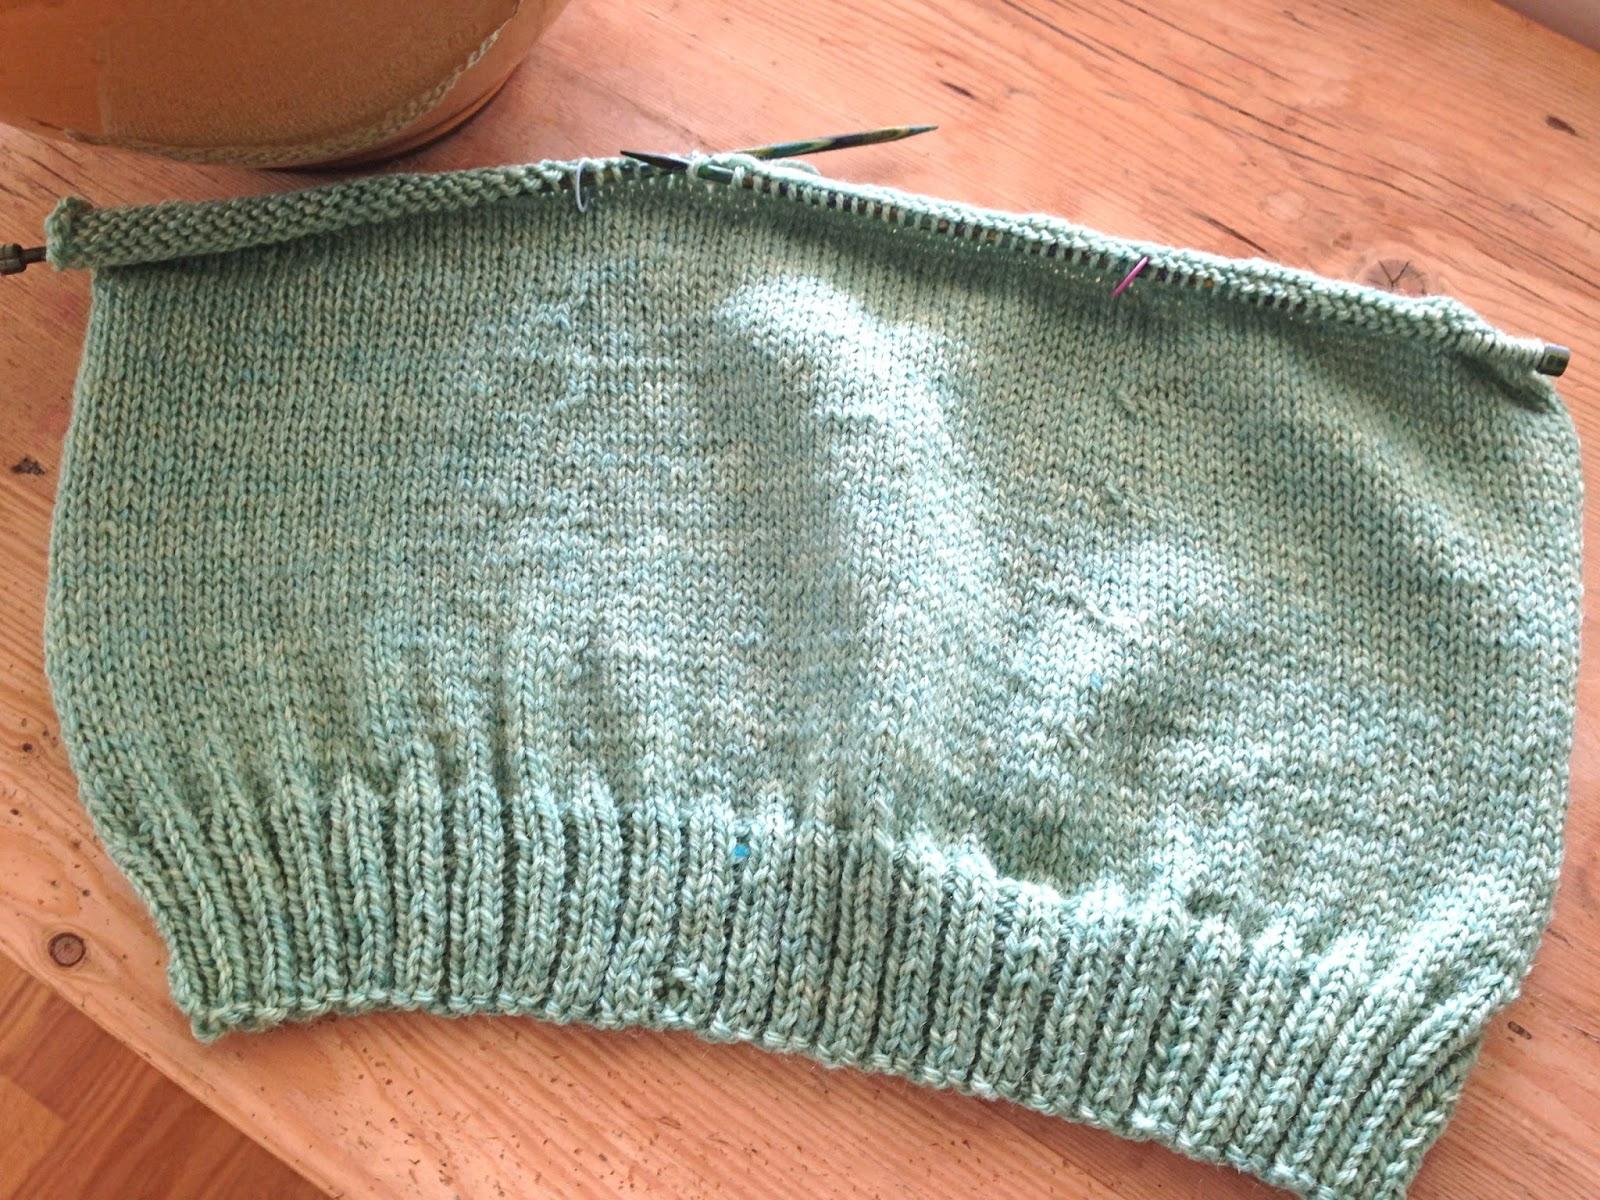 Knitting A Sweater Neckline : Options kal progress and a v neck tutorial knitionary